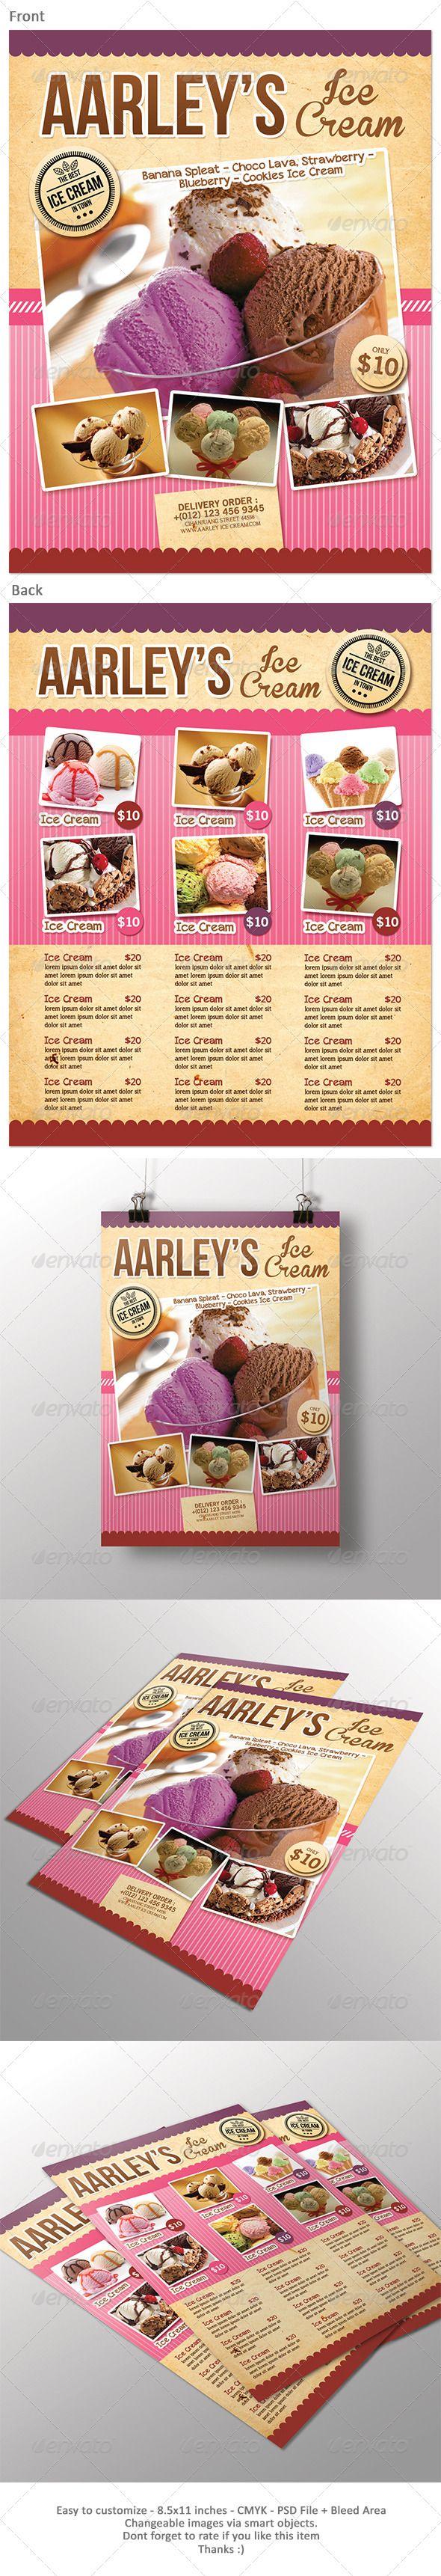 Ice Cream Menu Flyer Template #design #alimentationmenu Download: http://graphicriver.net/item/ice-cream-menu-flyer/6605268?ref=ksioks